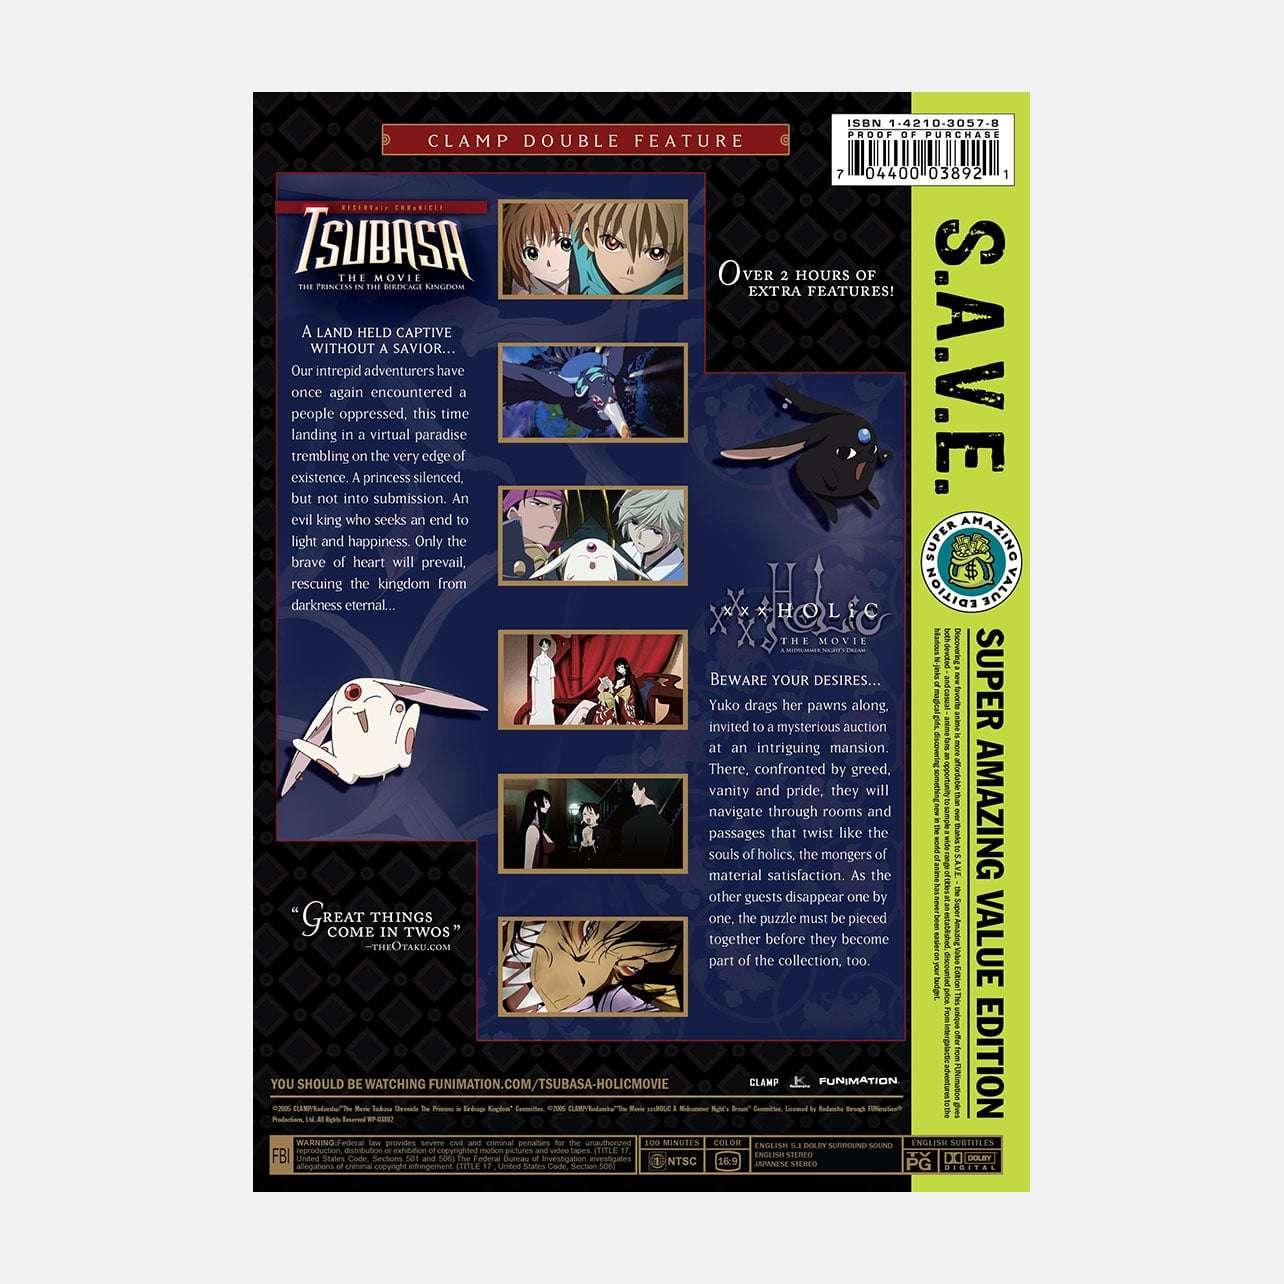 CLAMP Double Feature: Tsubasa And XxxHOLiC Movies S.A.V.E